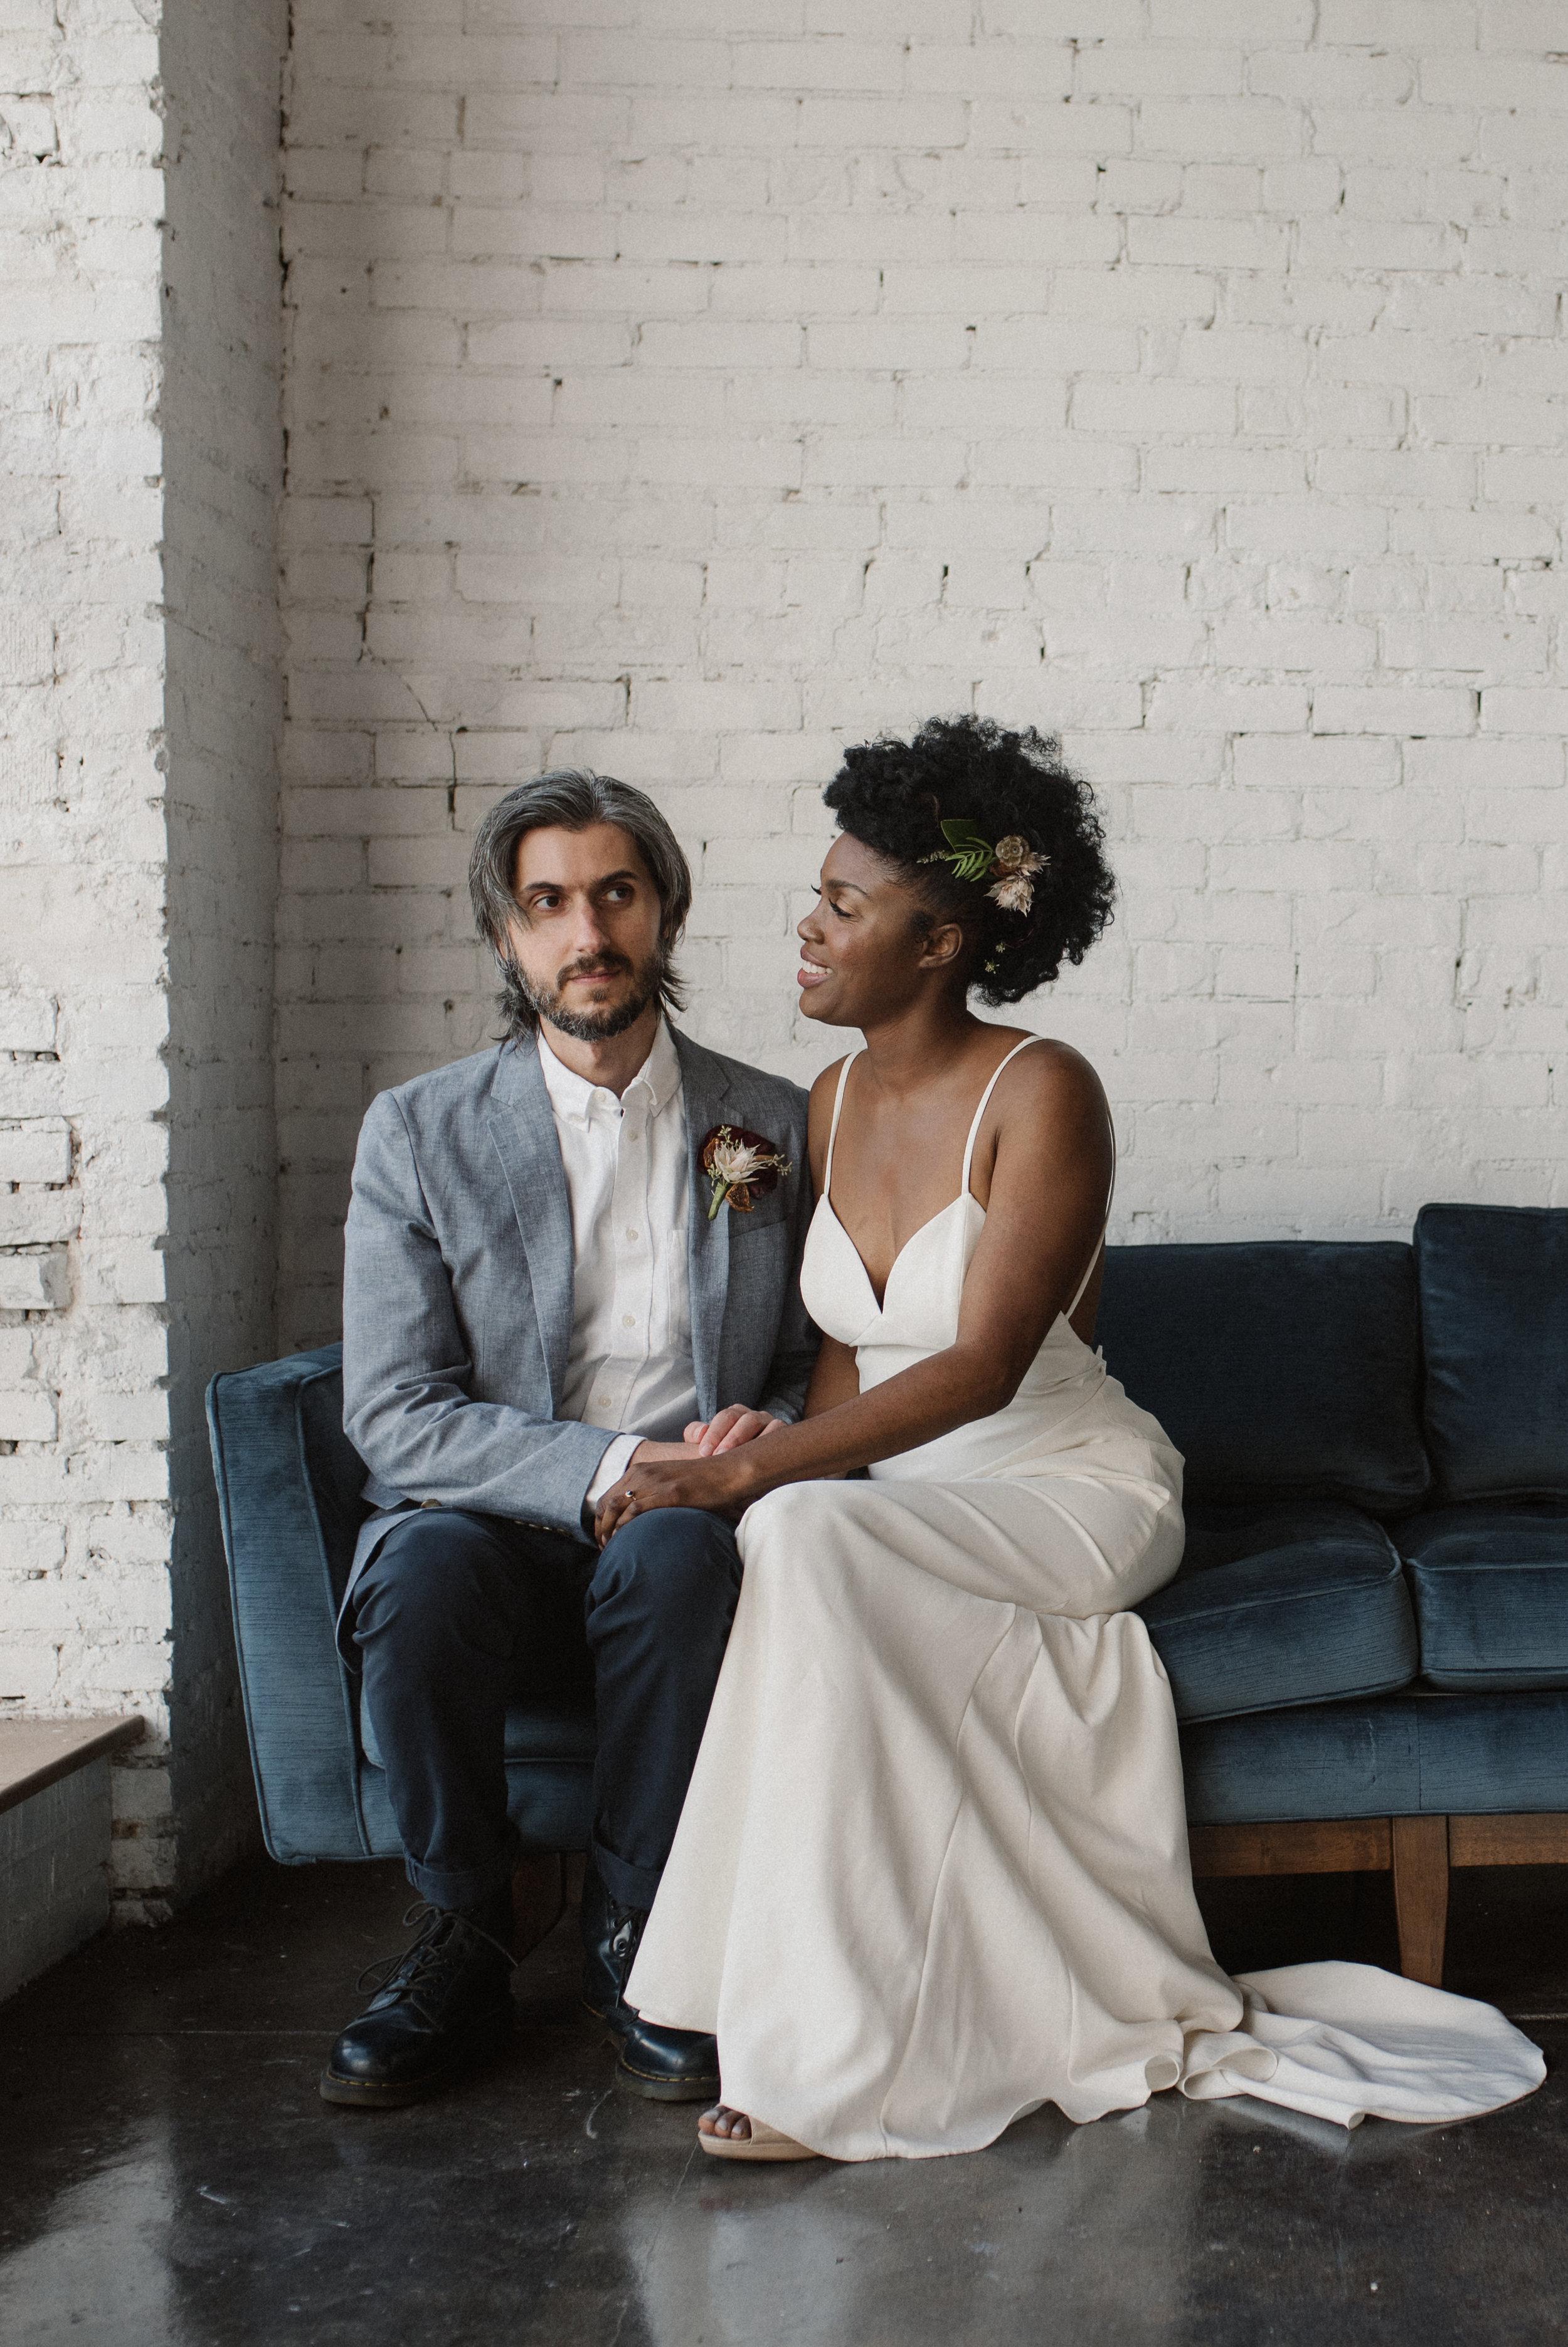 haus-820-minimal-editorial-wedding-styled-shoot-3.jpg